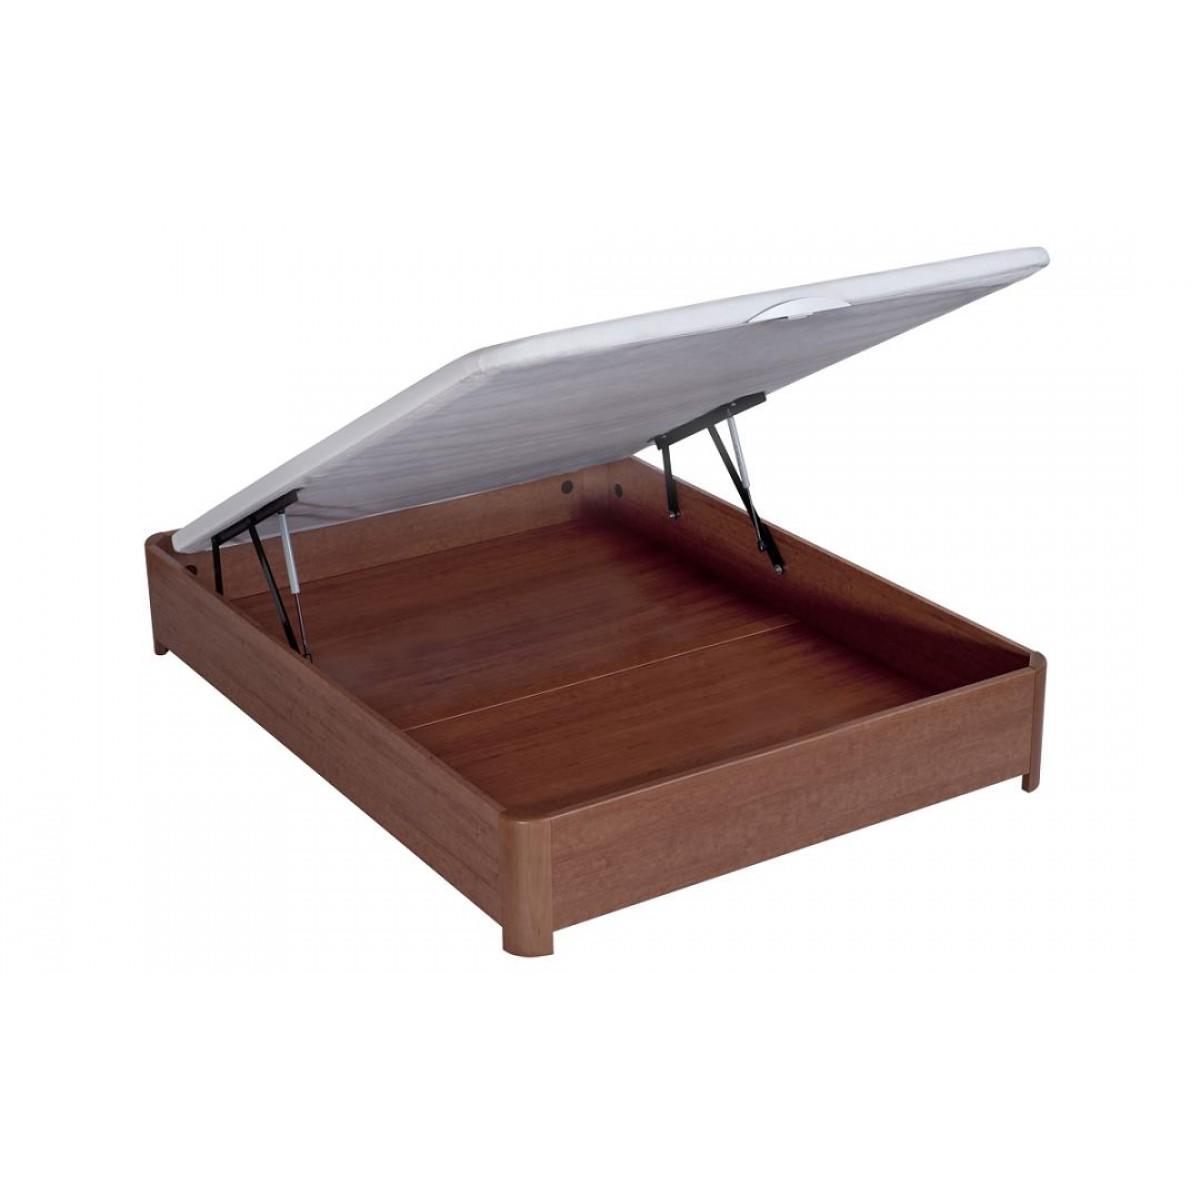 bultex sommier coffre madera weng 120x190 cat gorie. Black Bedroom Furniture Sets. Home Design Ideas